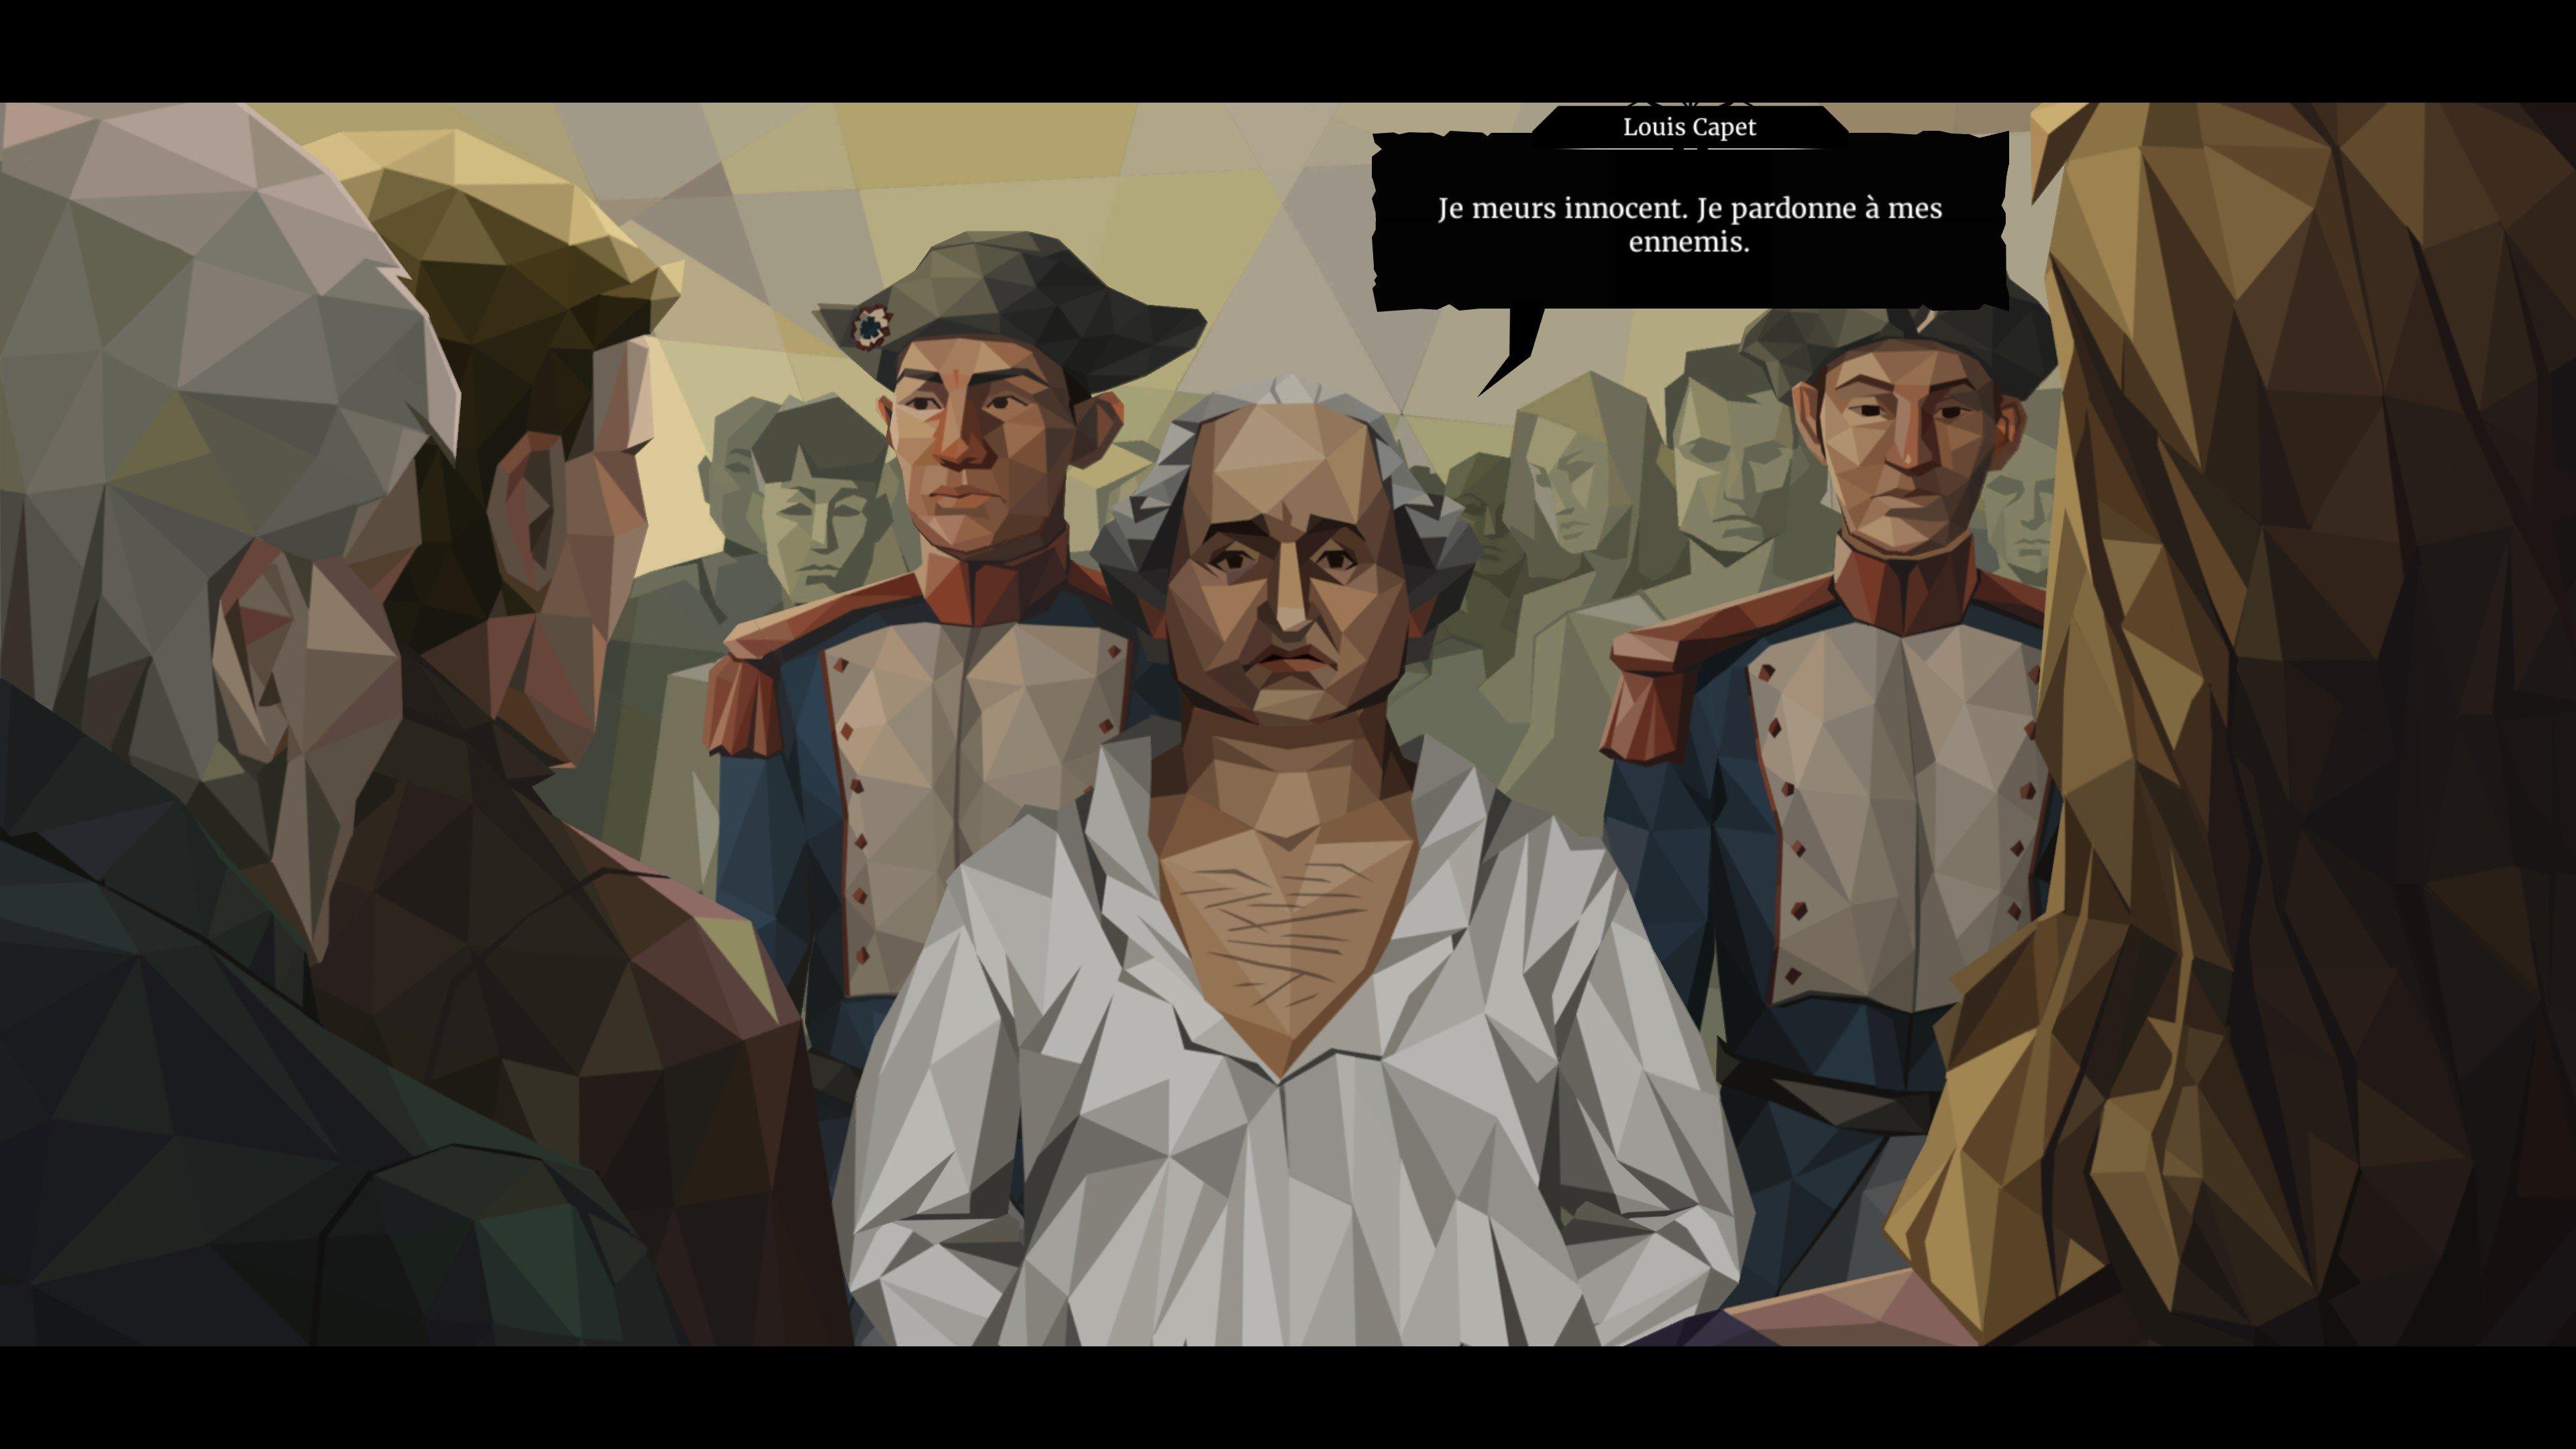 We-Revolution-Screen-gameblog-test -10-